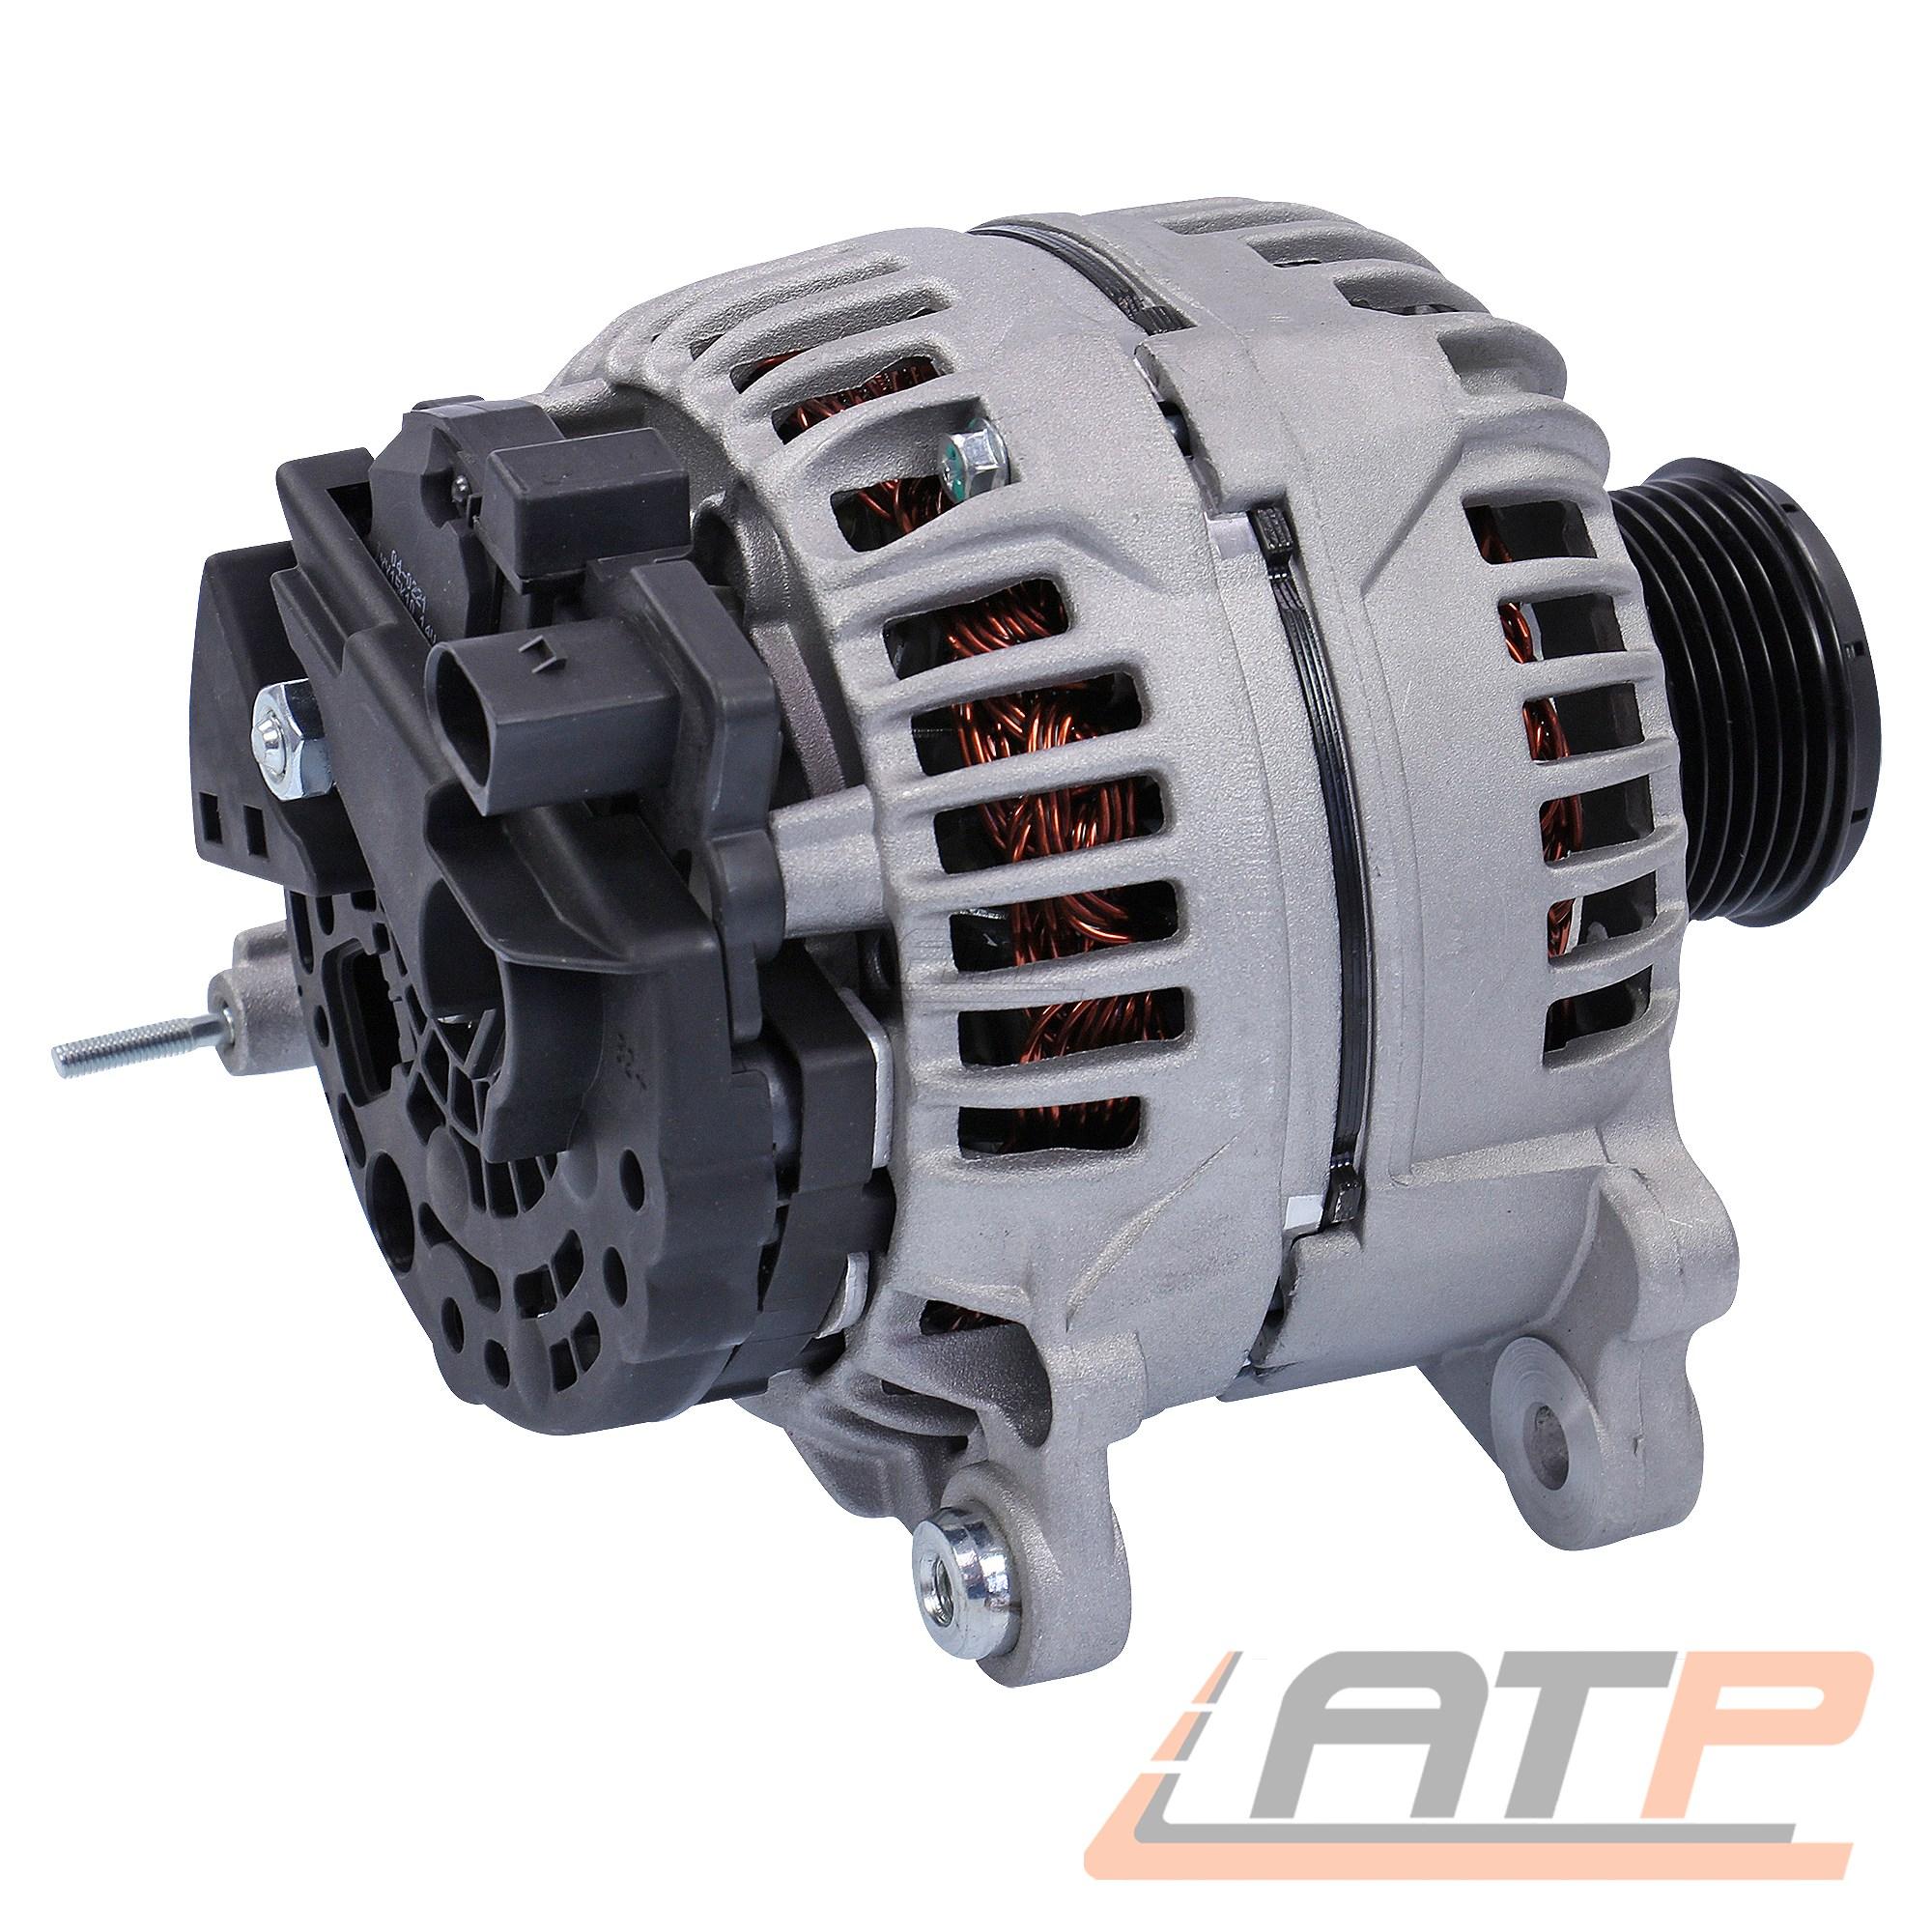 LICHTMASCHINE GENERATOR 120-A VW POLO 6N 6N2 9N 9A 1.4 TDI